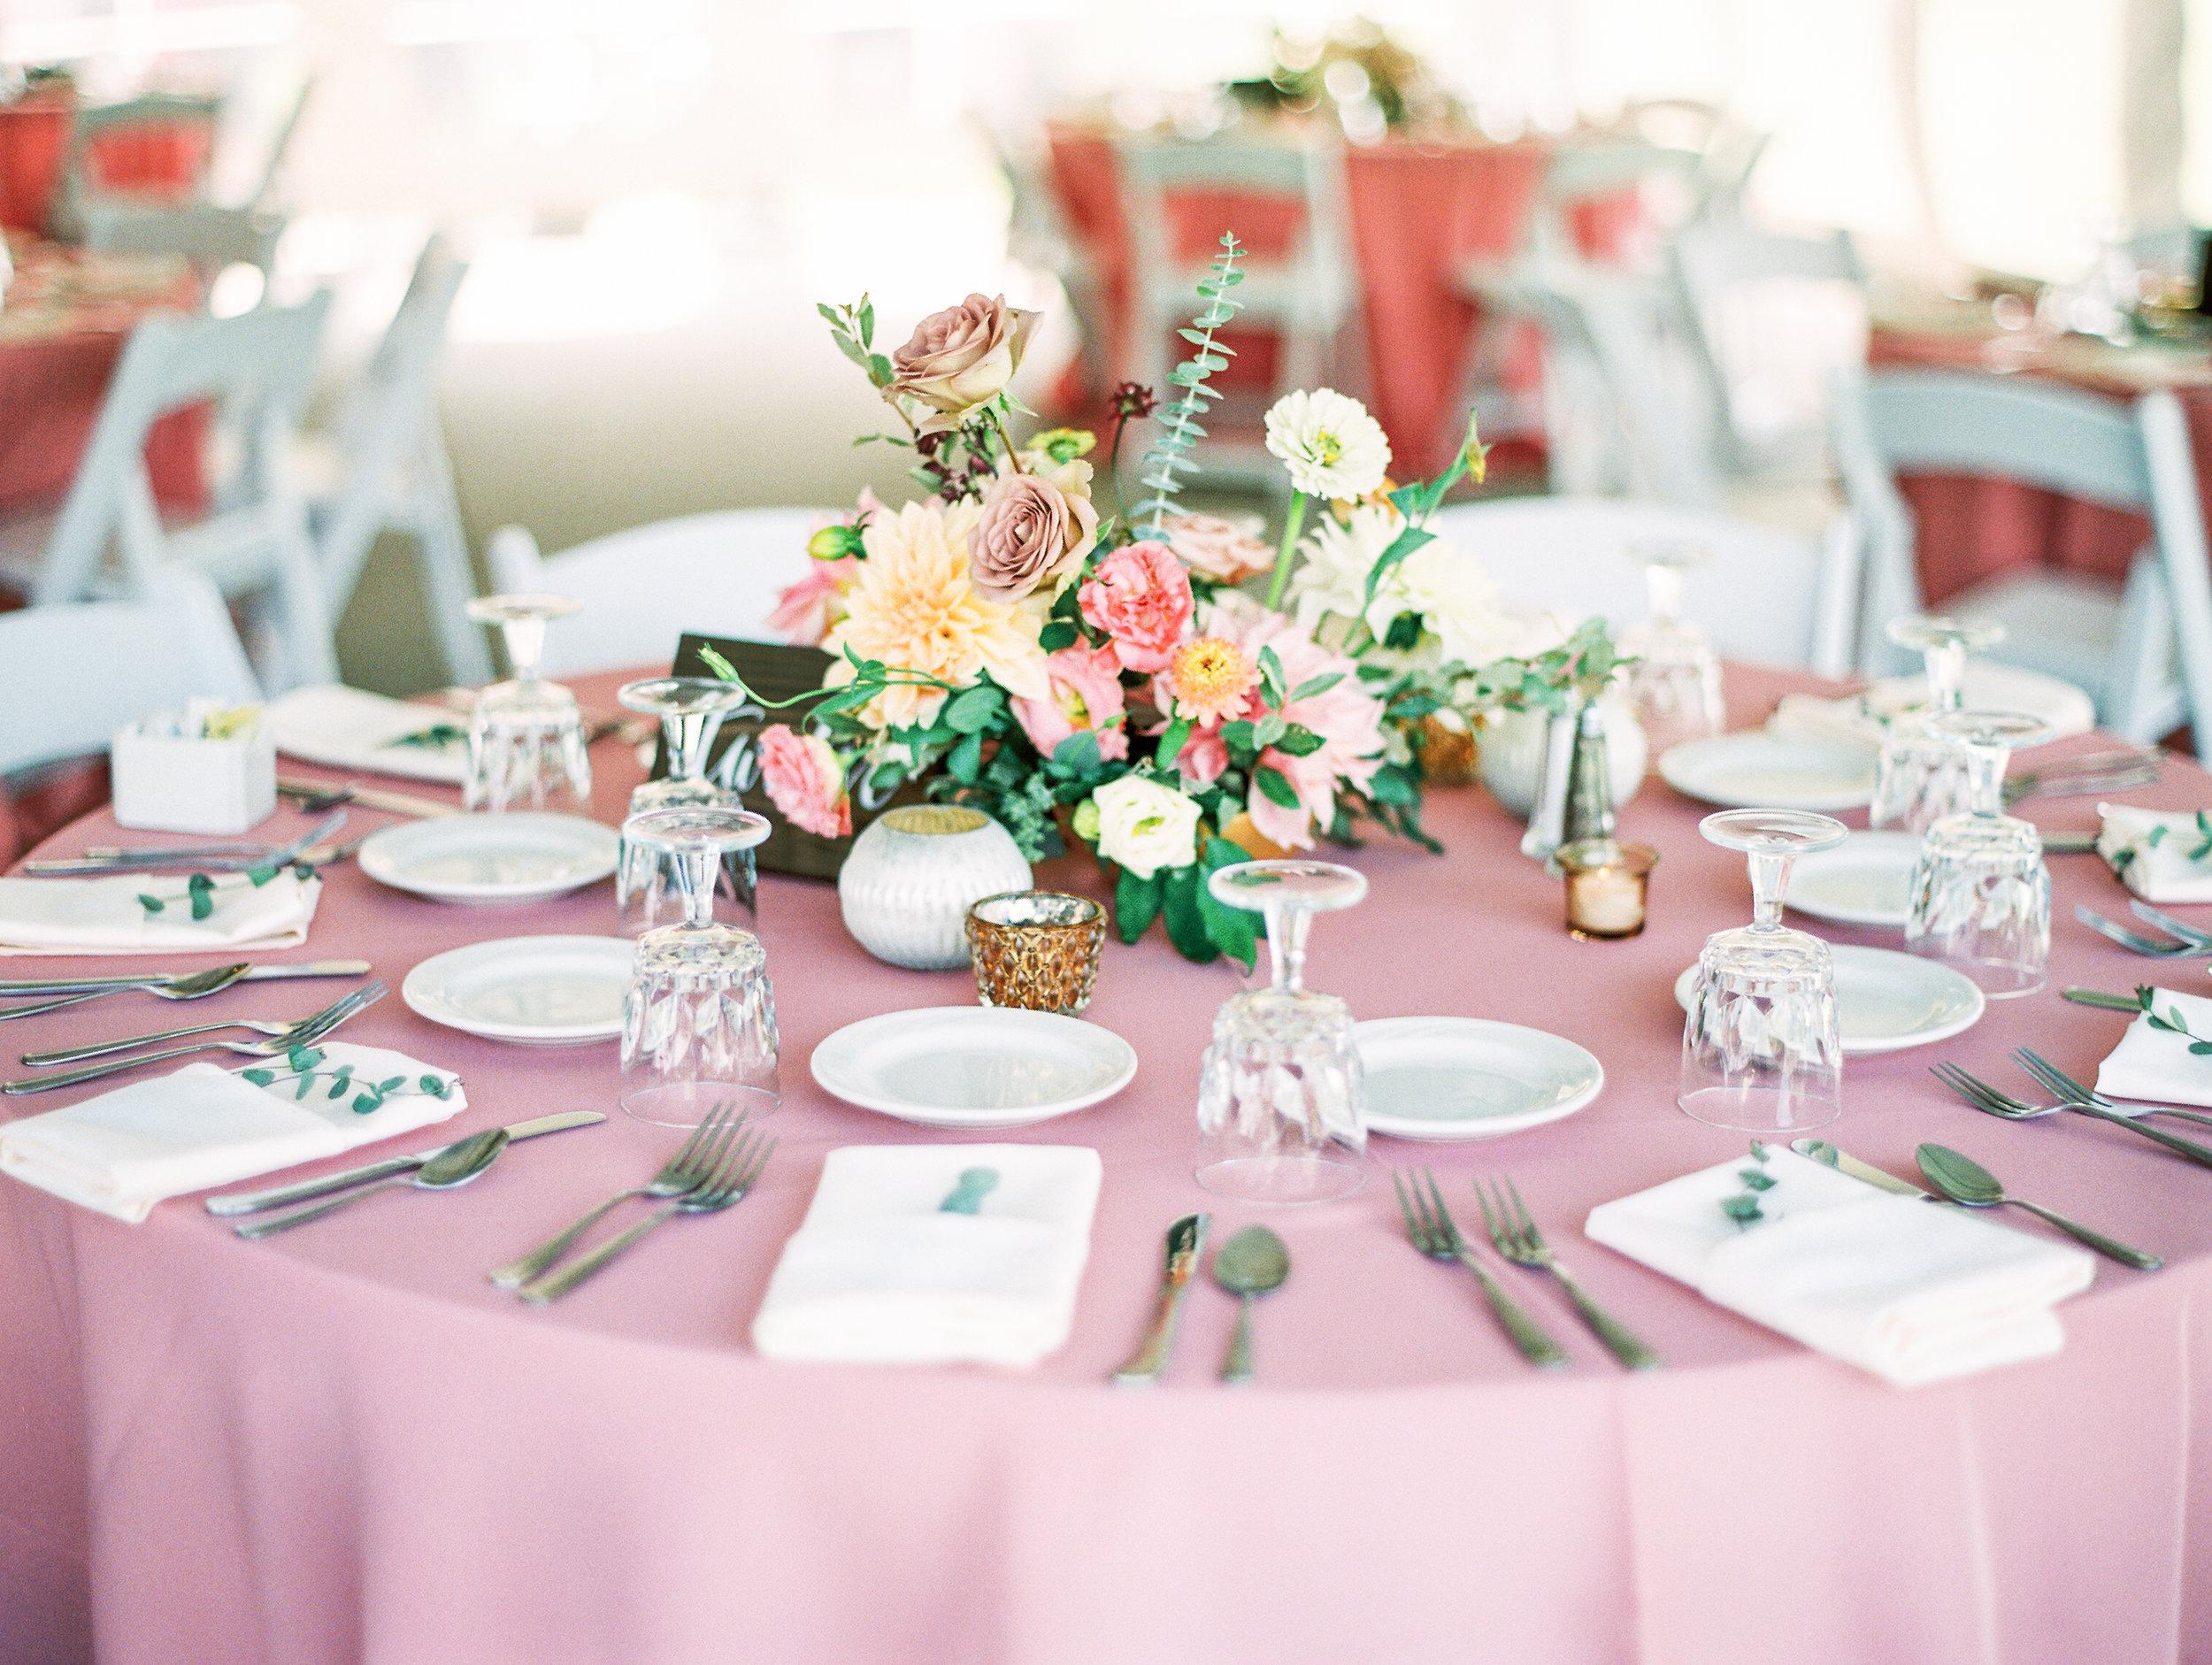 Zoller+Wedding+Reception+Detailsf-22.jpg